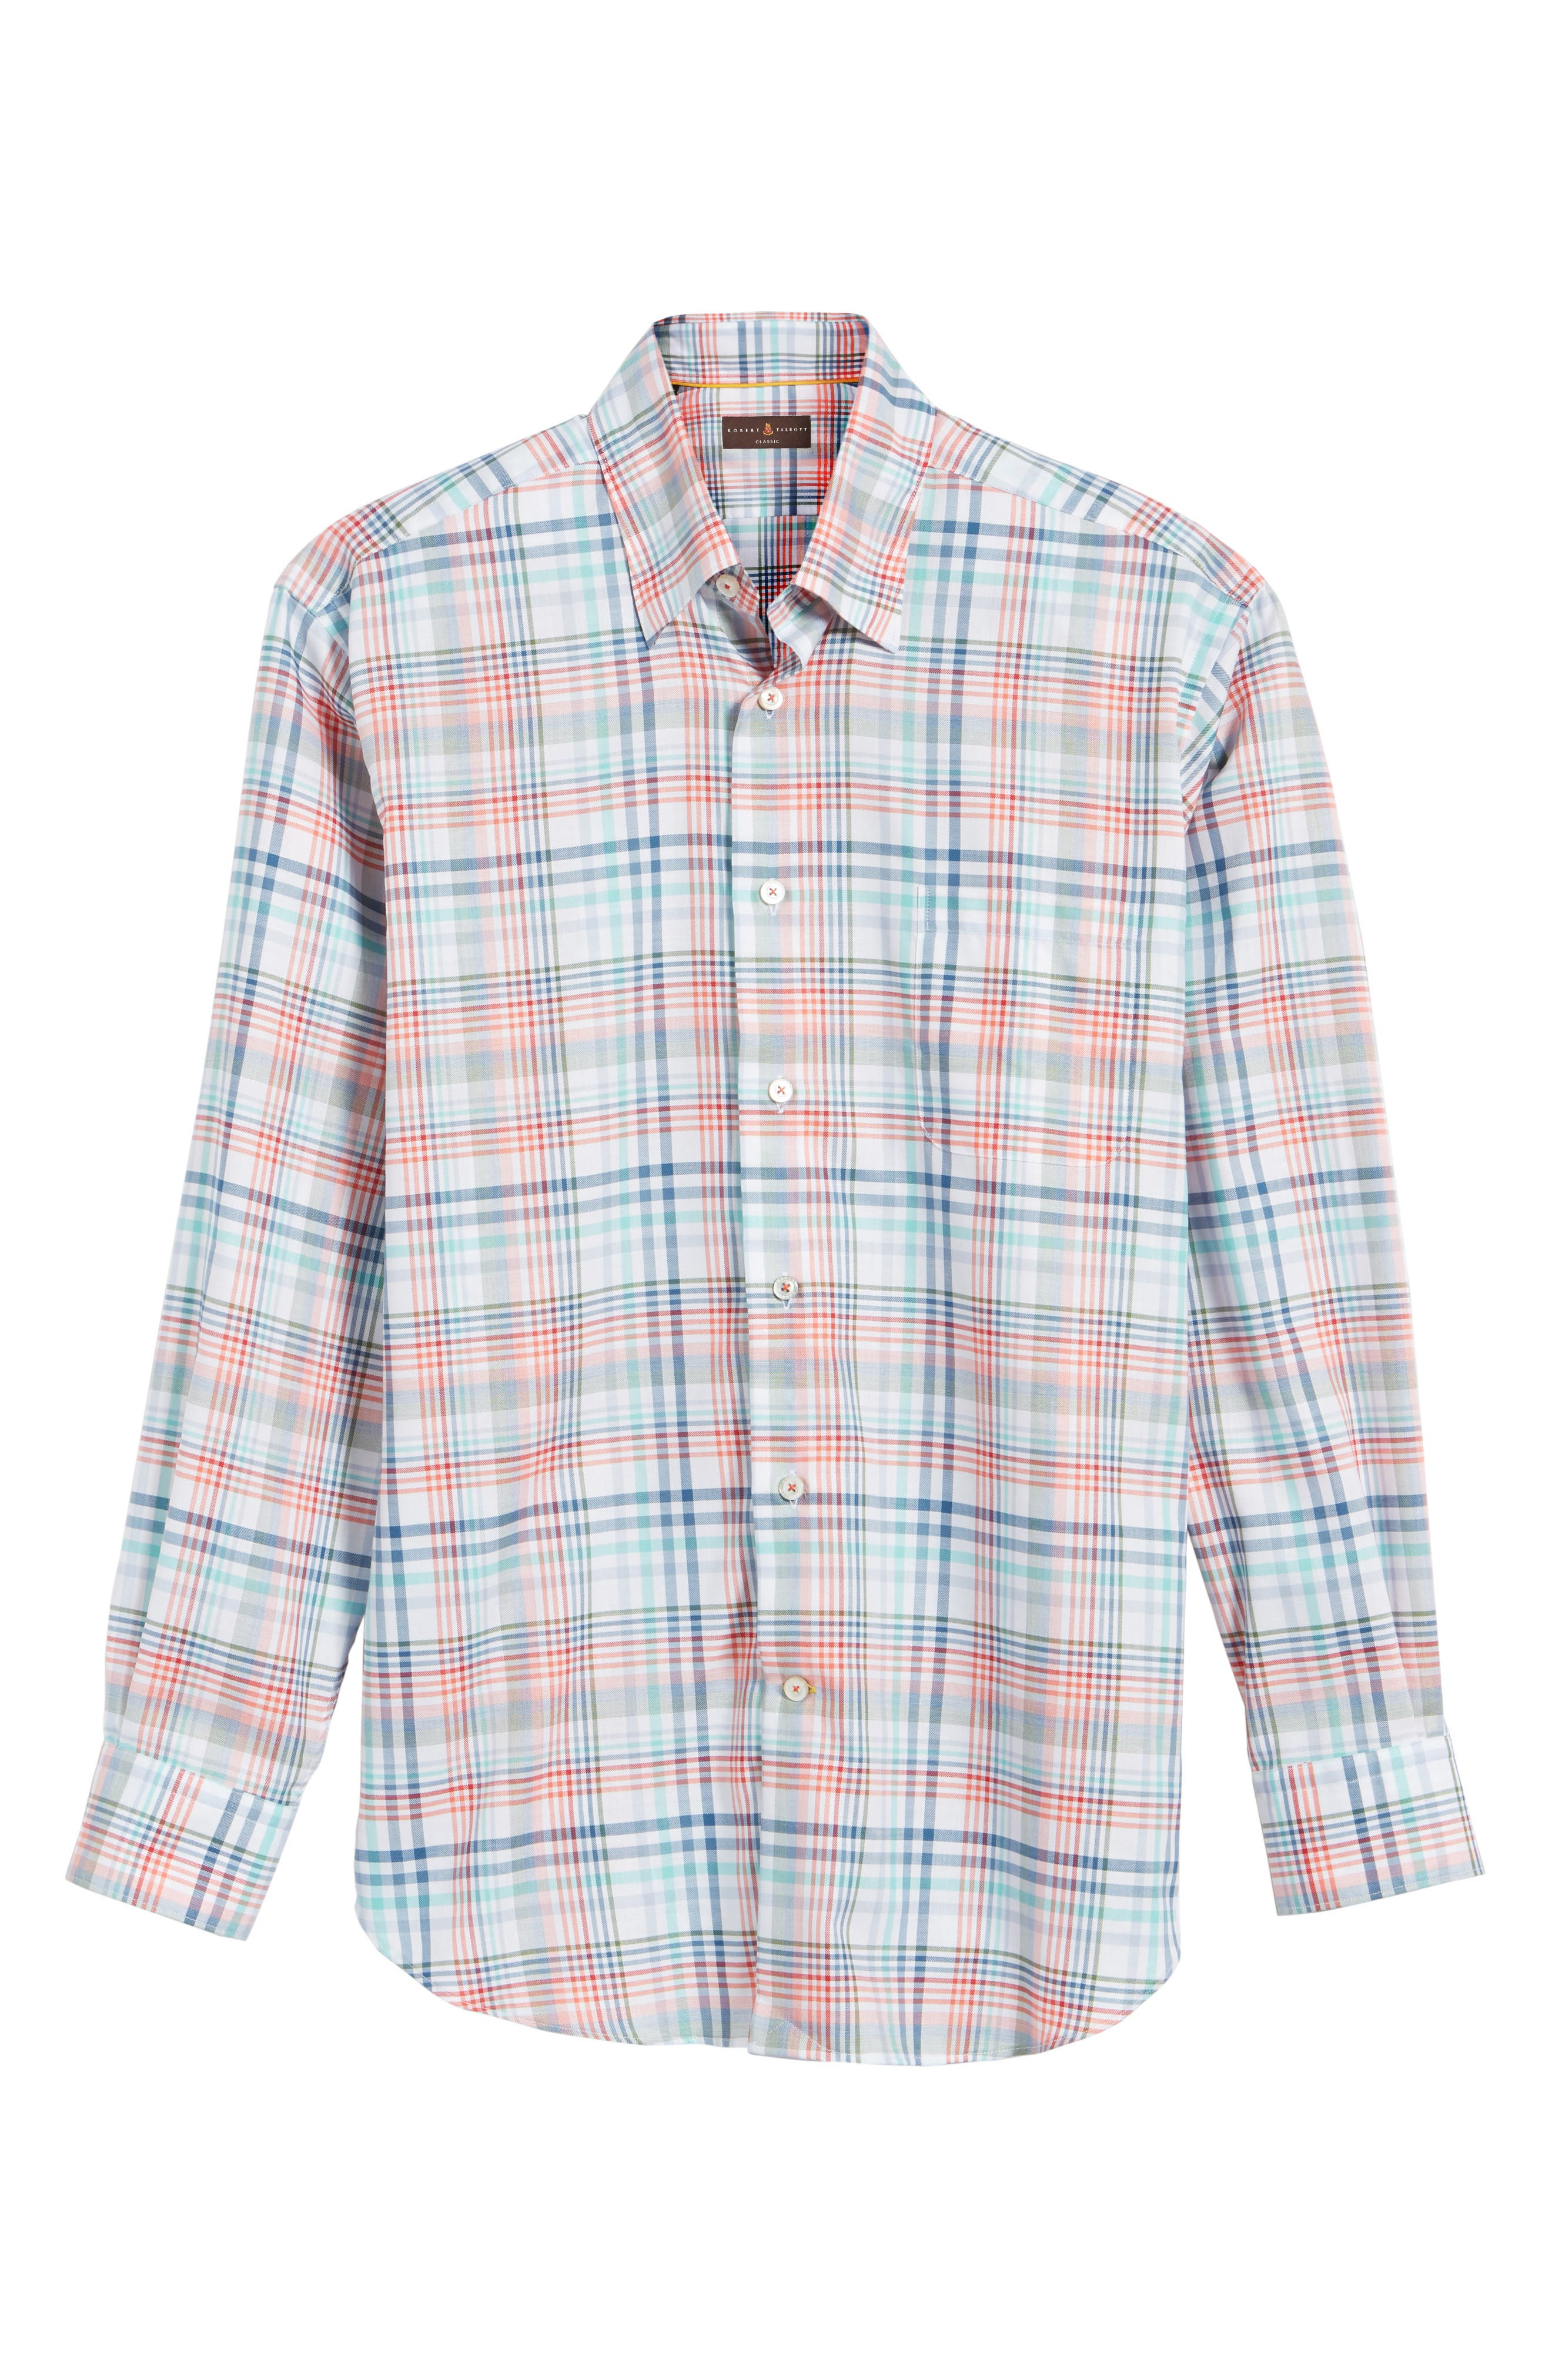 ROBERT TALBOTT,                             Anderson Classic Fit Plaid Twill Sport Shirt,                             Alternate thumbnail 6, color,                             860